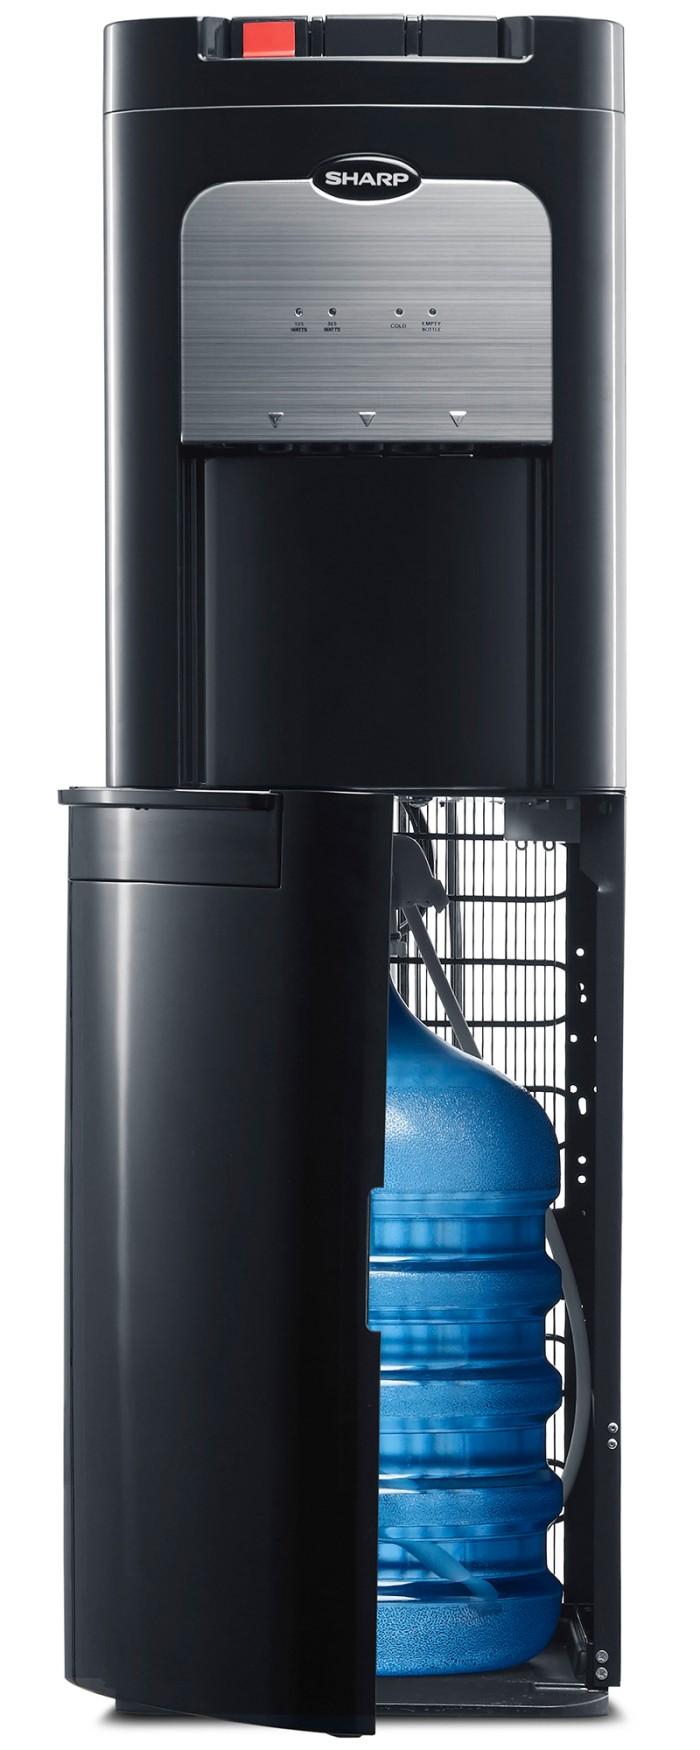 Sharp Swd 72ehl Bk Dispenser Galon Bawah Hitam Khusus Jadetabek T102ed Wh Putih Top Loading Water Bottom Free Jabodetabek